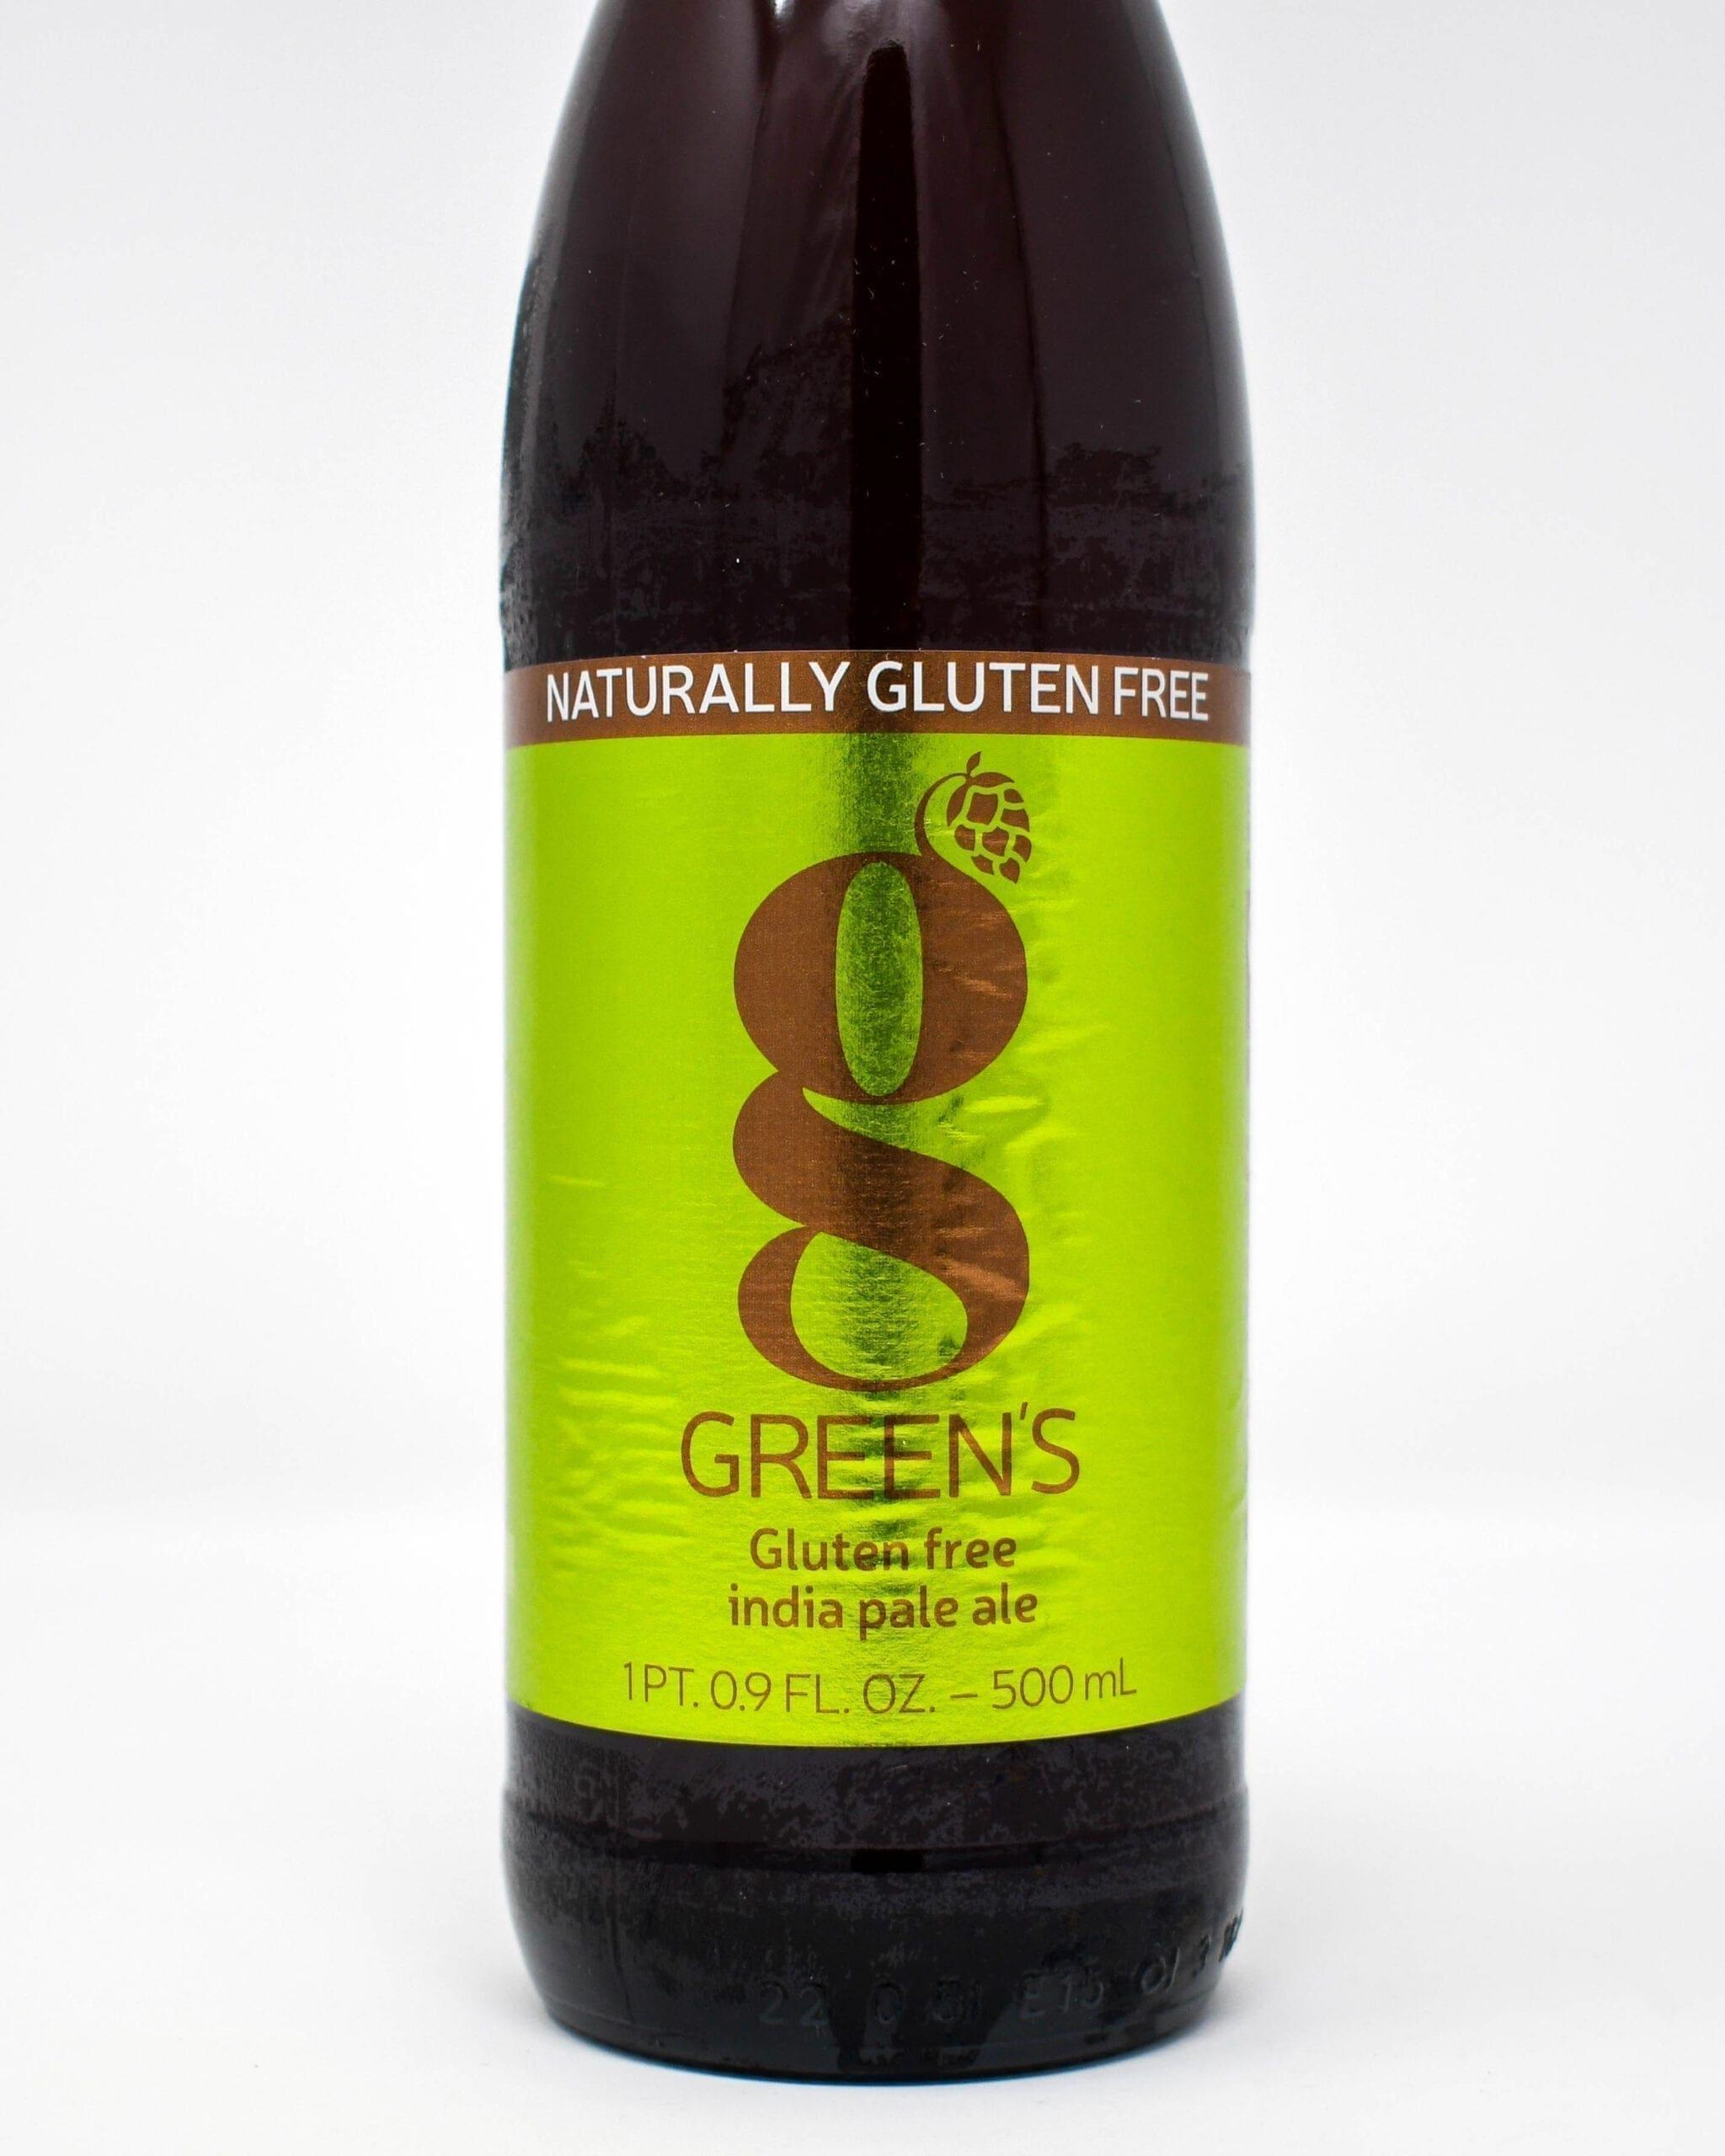 Green's, Gluten Free IPA